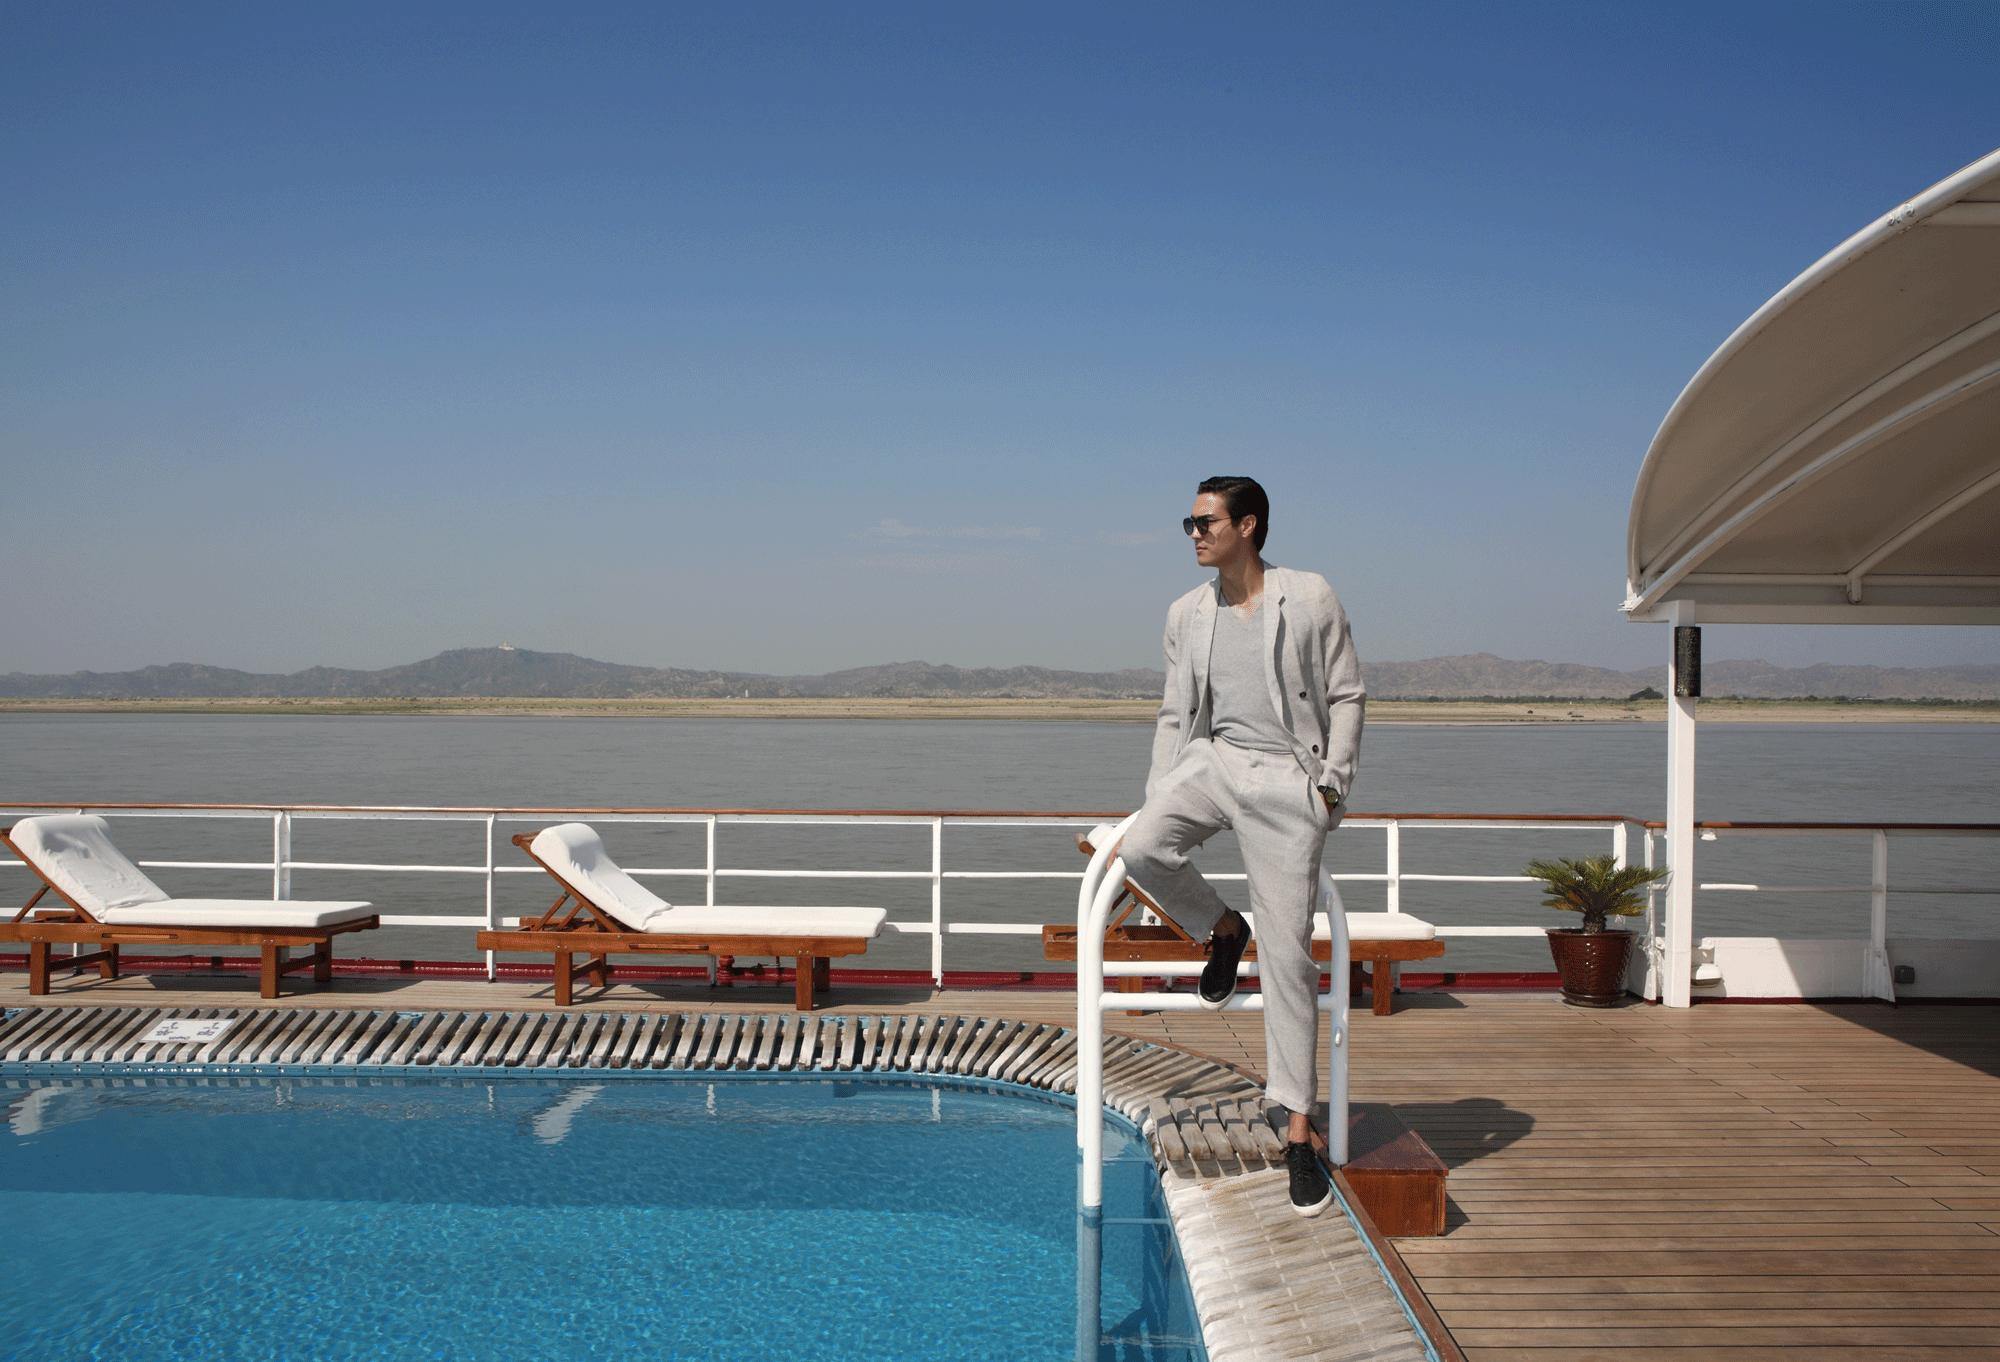 suit : Emporio Armani / tshirt : JOCKEY / sunglasses : SPEKTRE